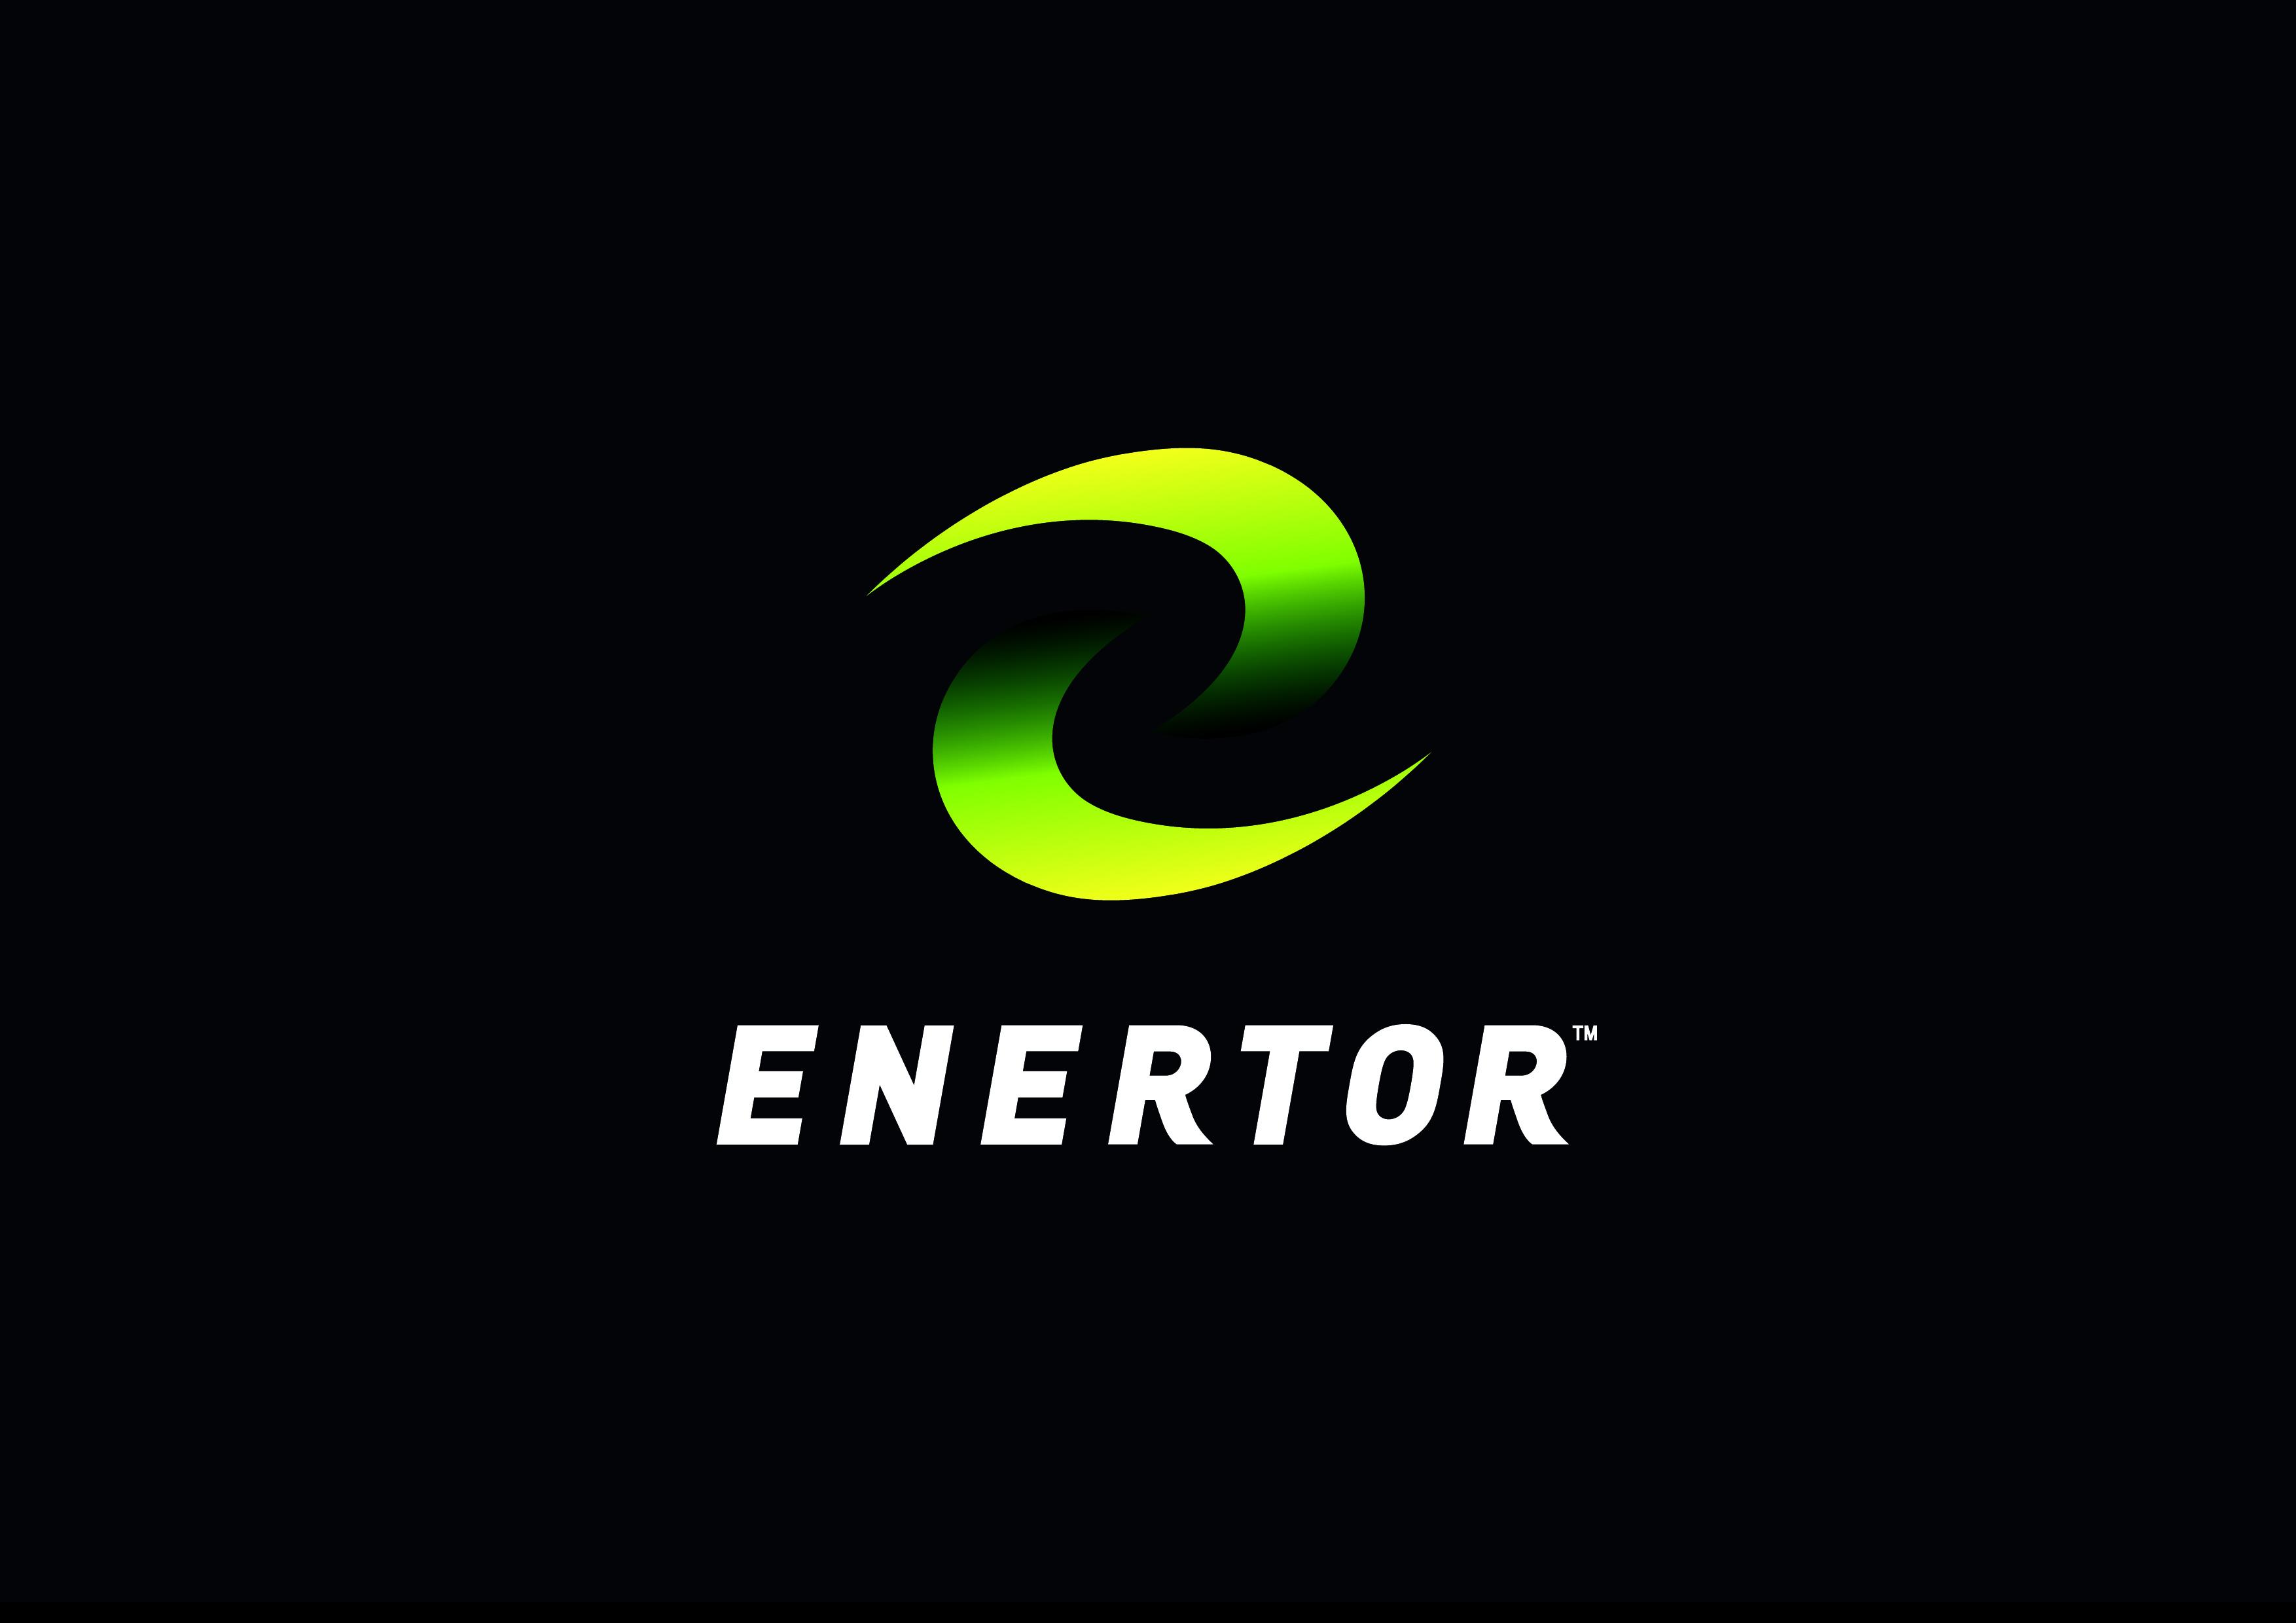 Usain announces new partnership with Enertor